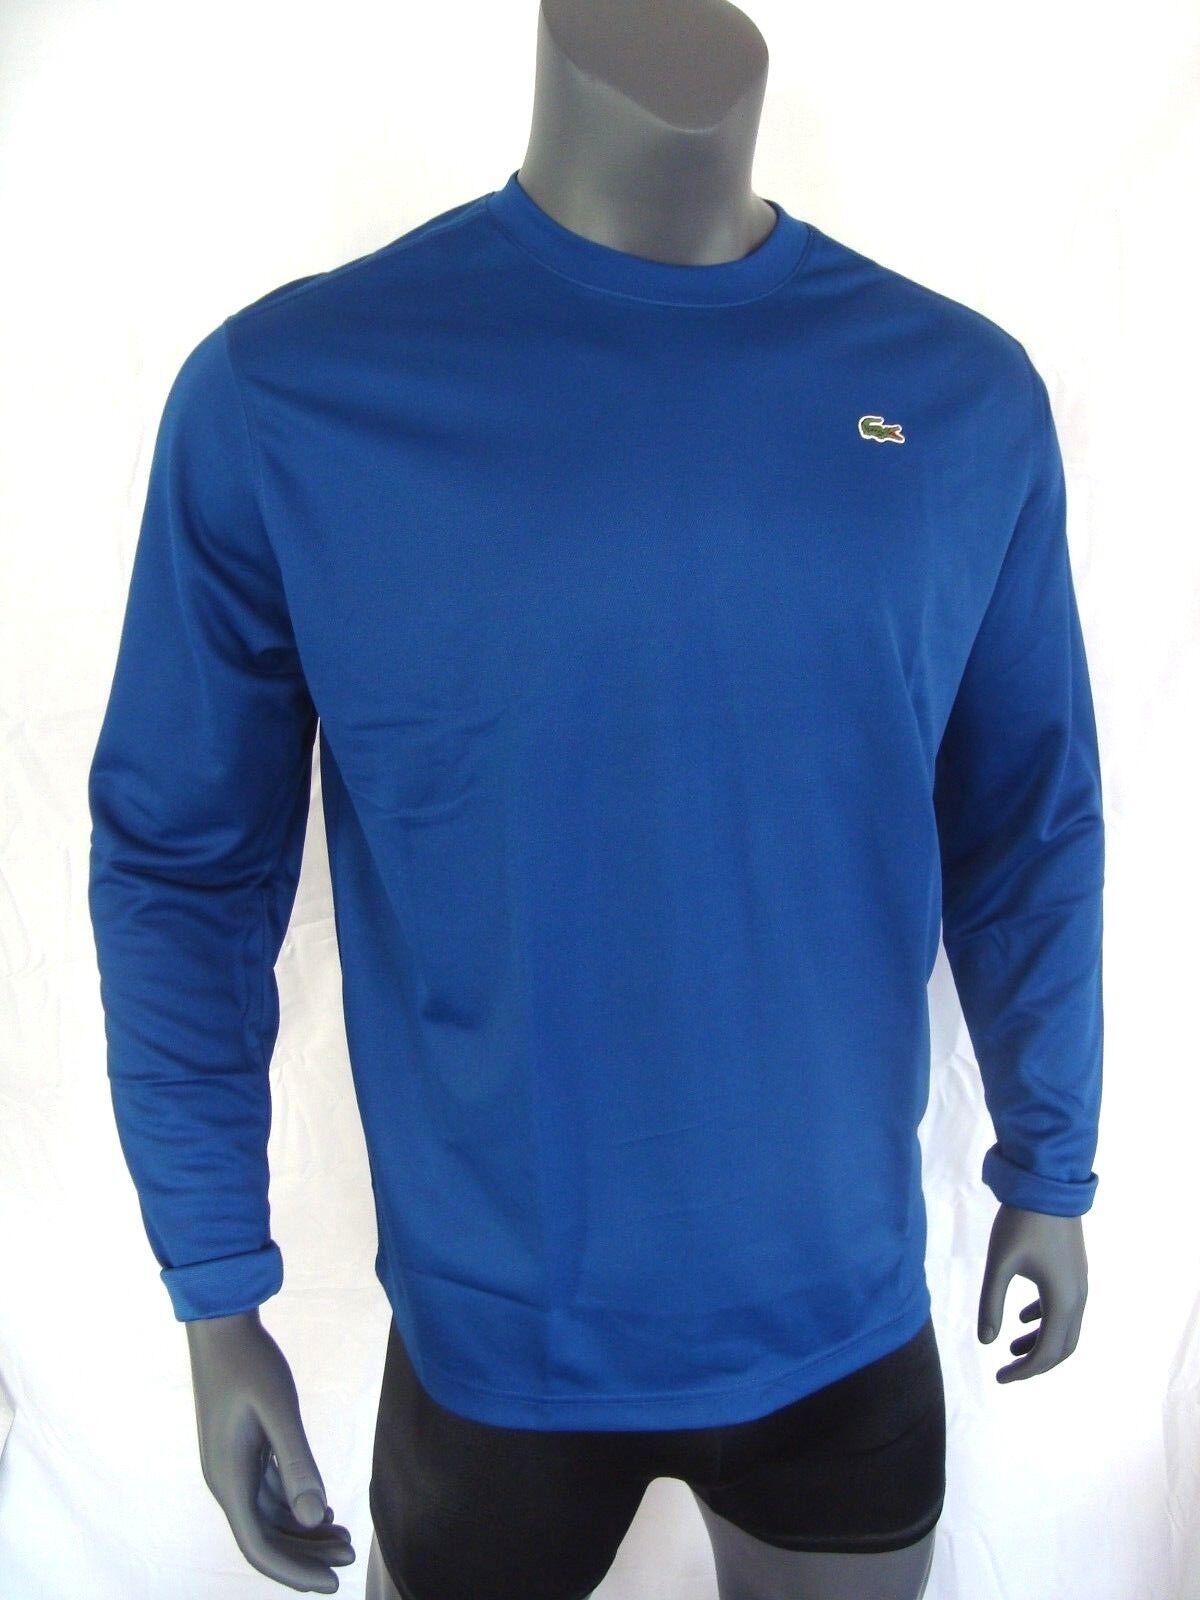 Lacoste Sport blu Poli Maglia Ls Uomo Maniche Lunghe T-Shirt Nuovo XL, 3XL, 4XL